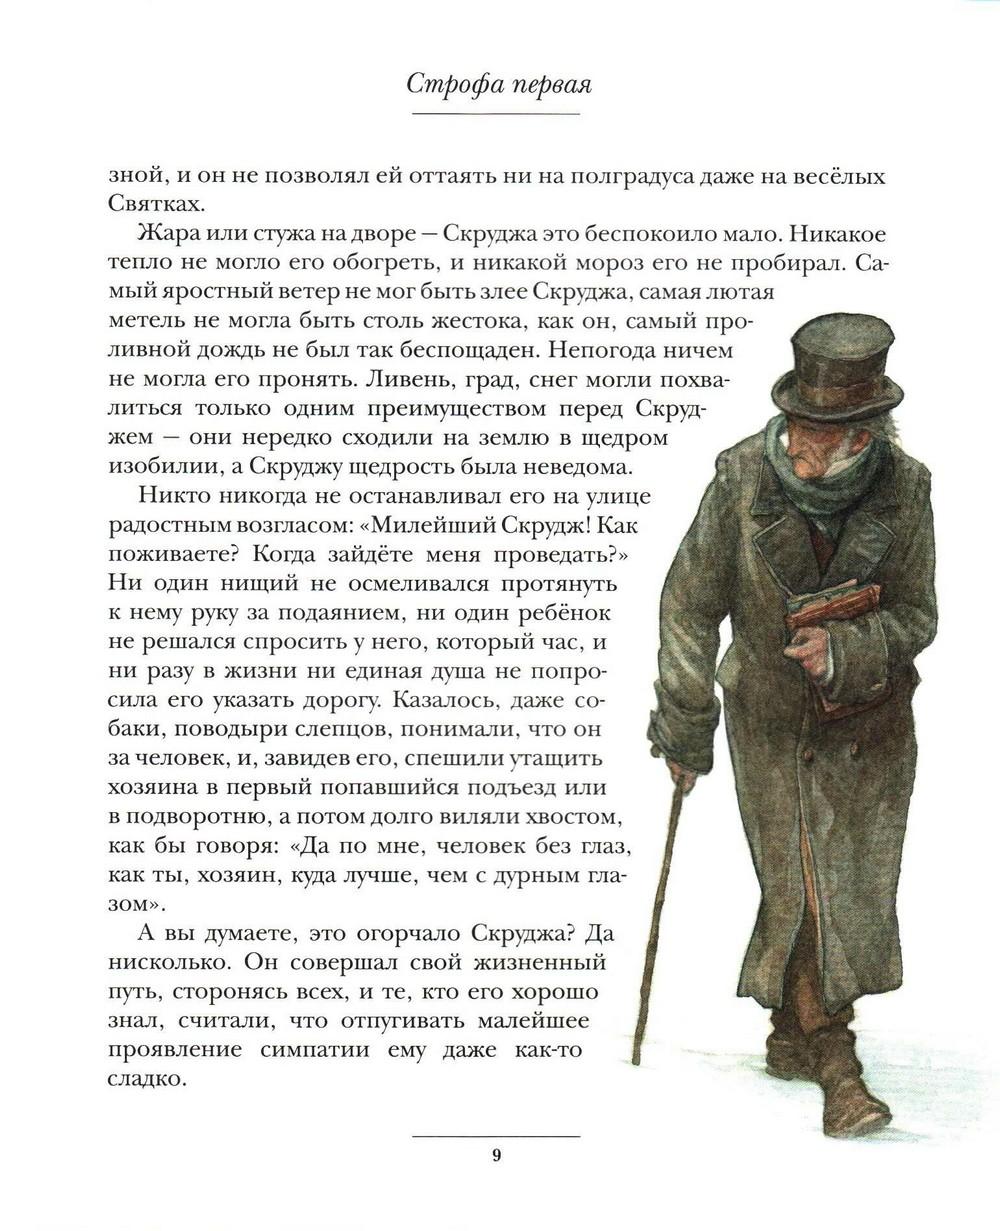 http://i2.imageban.ru/out/2013/12/06/dd59d0a9fdc312f4c914d18d546523d4.jpg